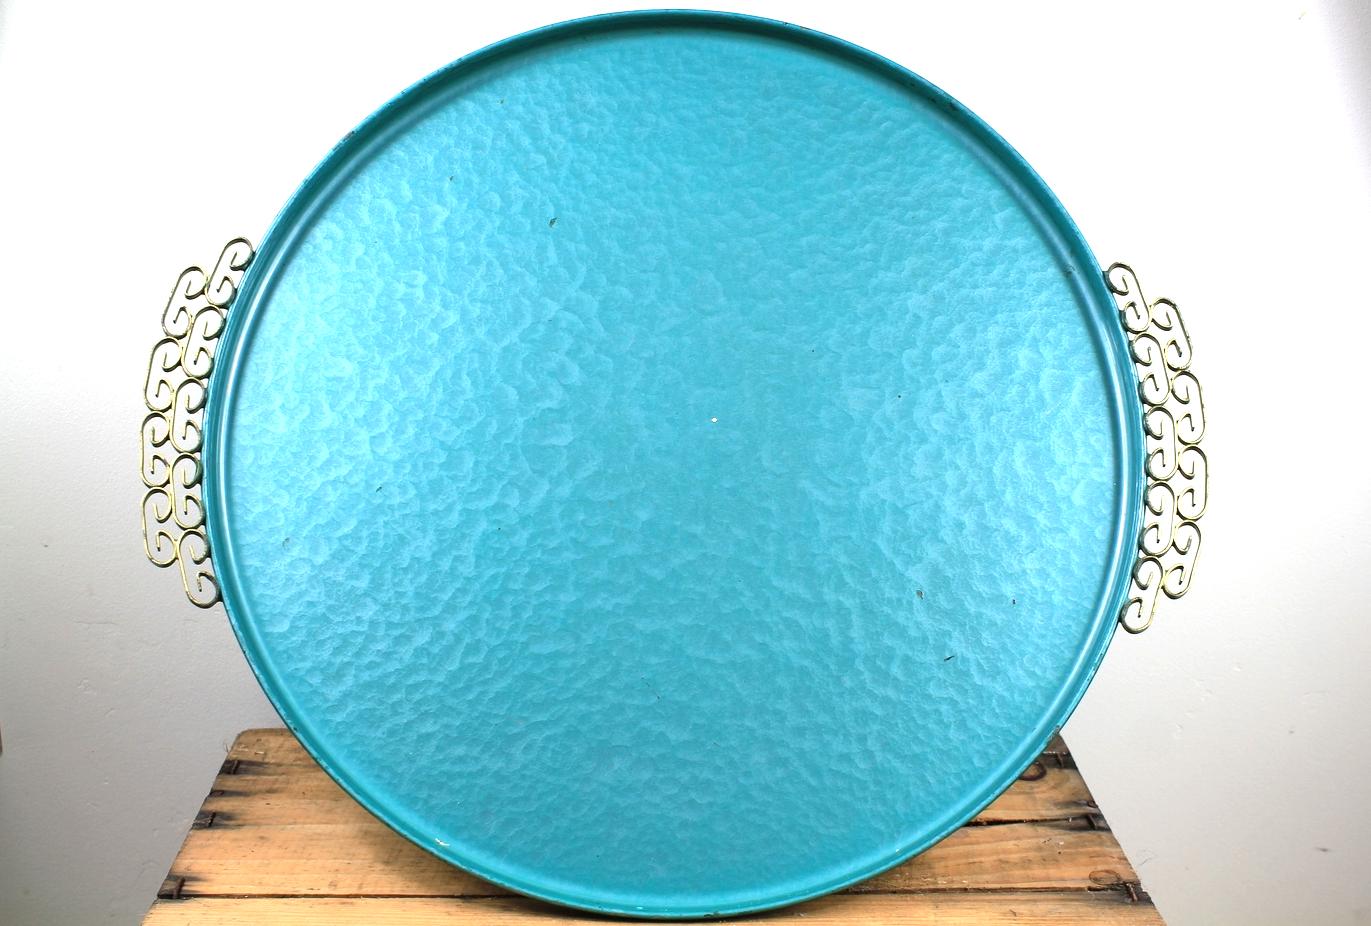 Turquoise Enamel Vintage Tray